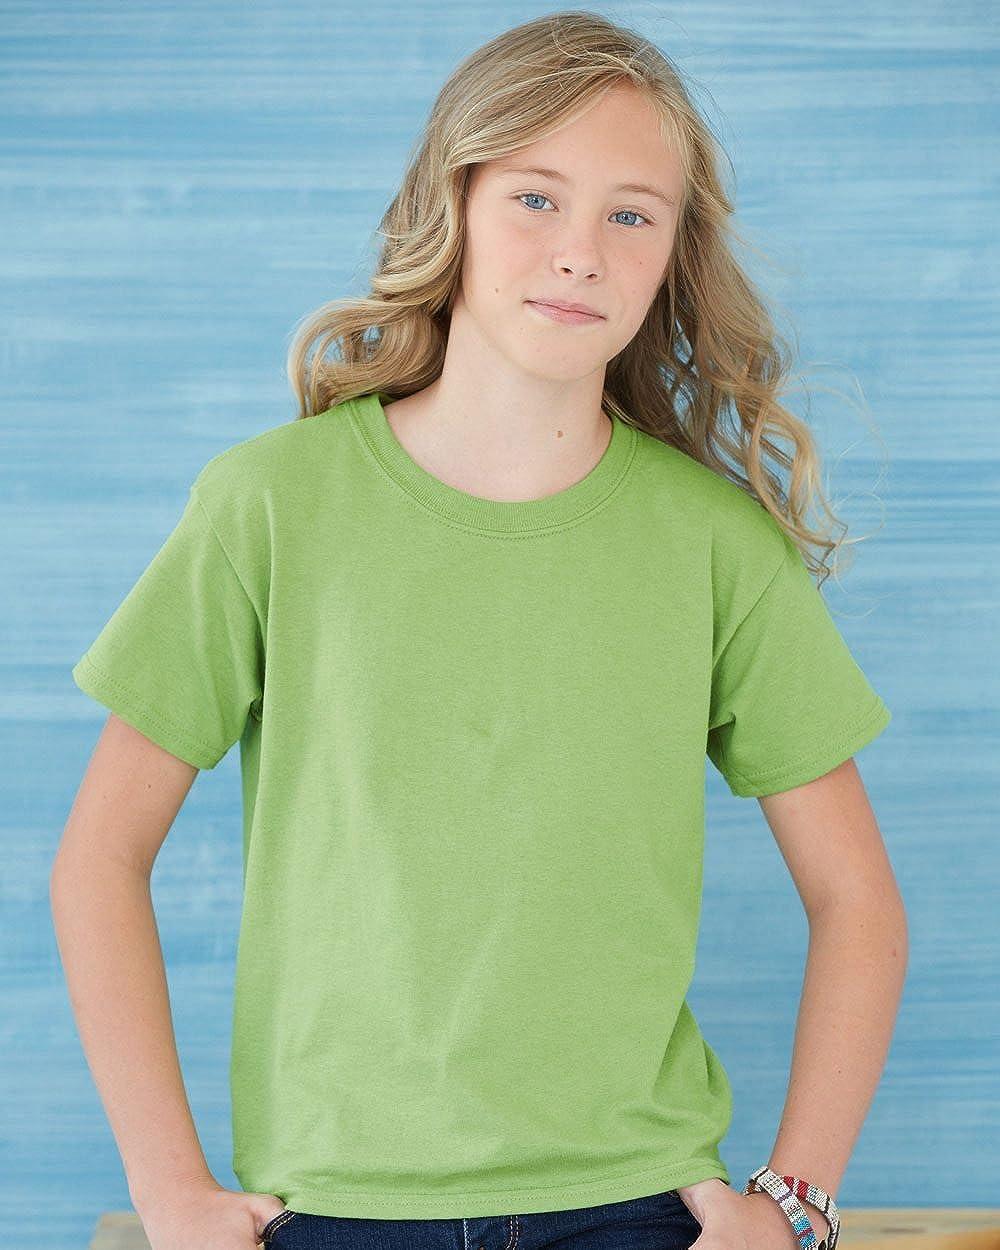 Vizor 1955 Rosa Parks Youth T Shirts Tees Nah Kids Shirts